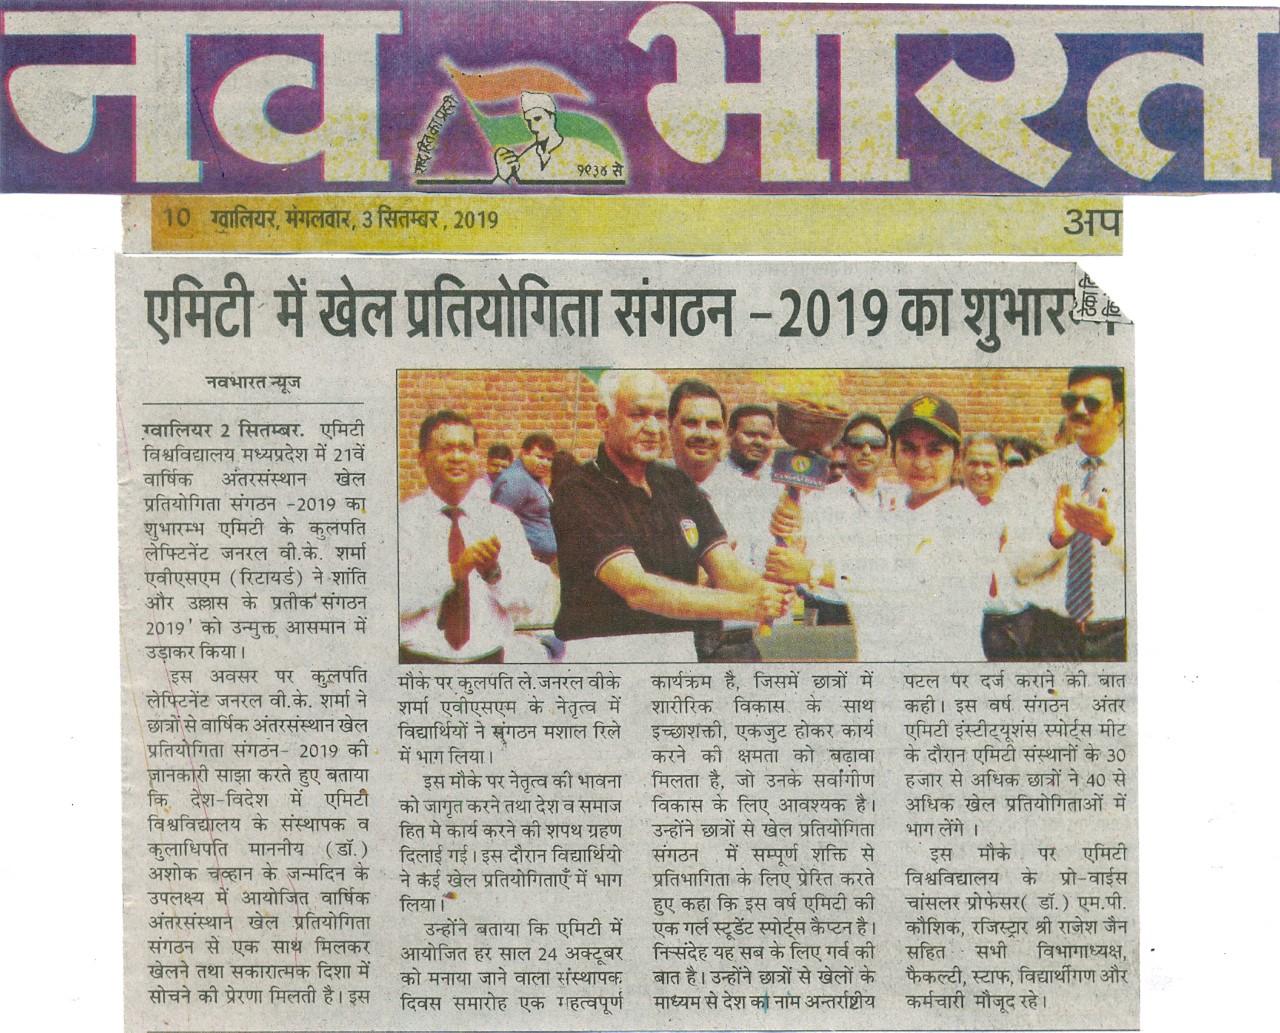 Nav Bharat - 03.09.2019-AUMP Mega Event Sangathan-2019-Amity